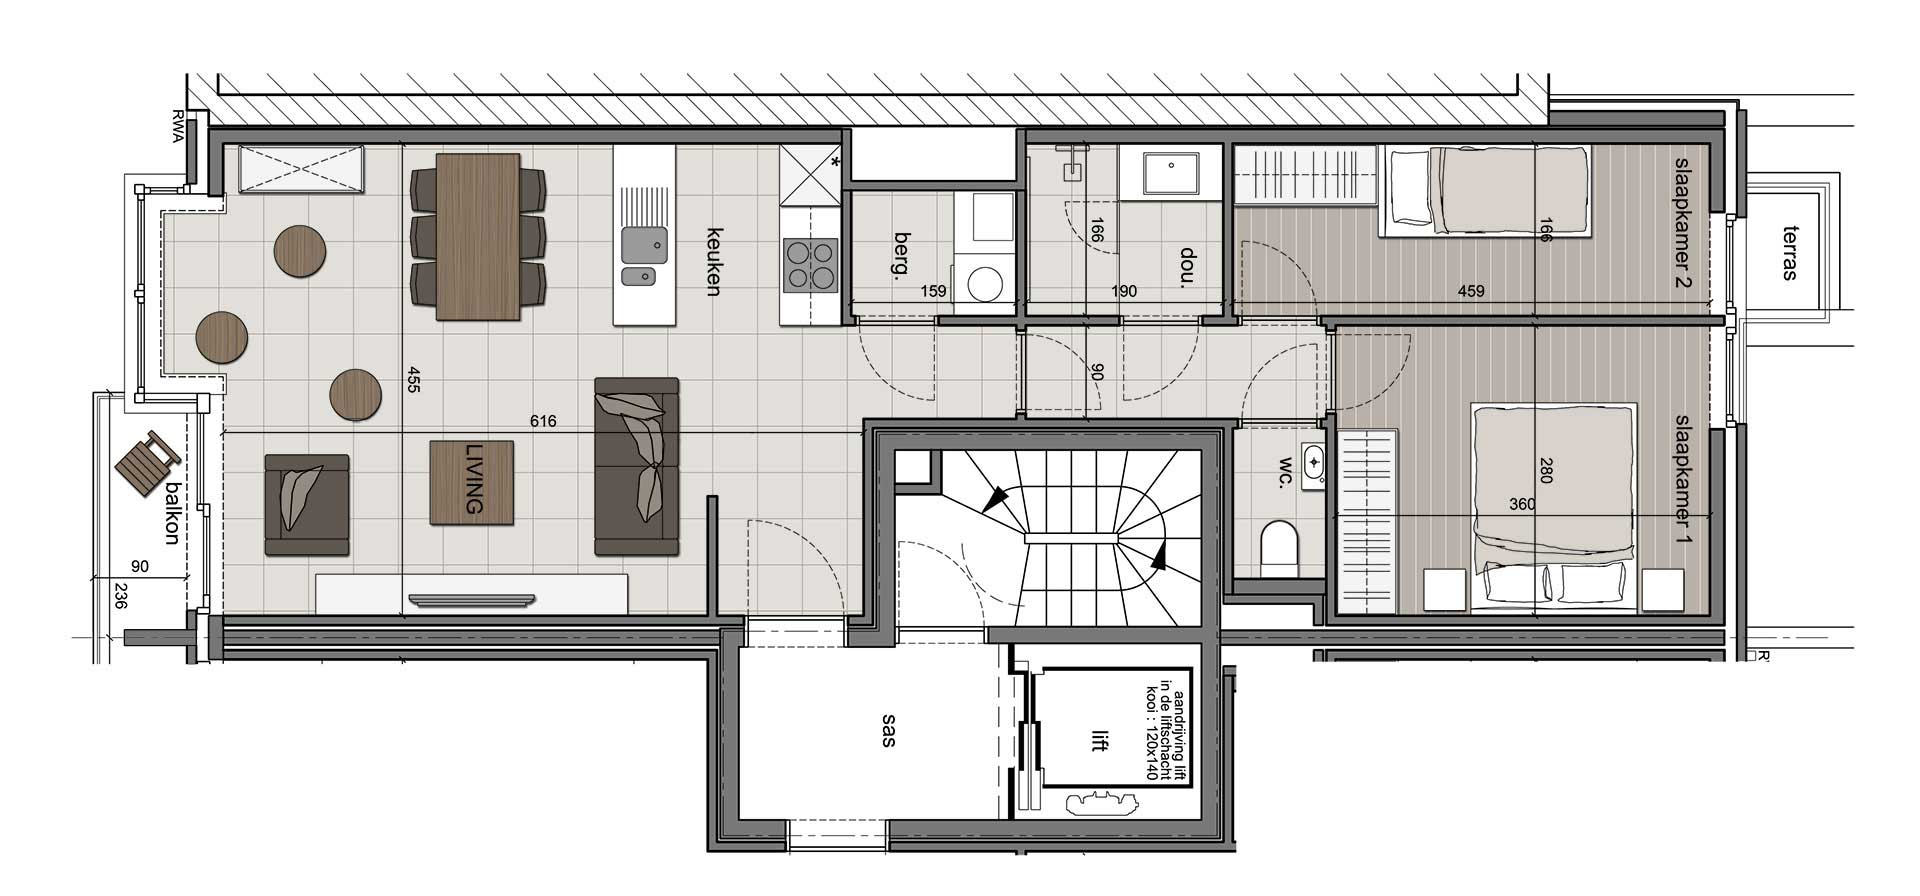 Residentie <br /> Winoc - image appartement-te-koop-koksijde-residentie-winoc-1.1 on https://hoprom.be